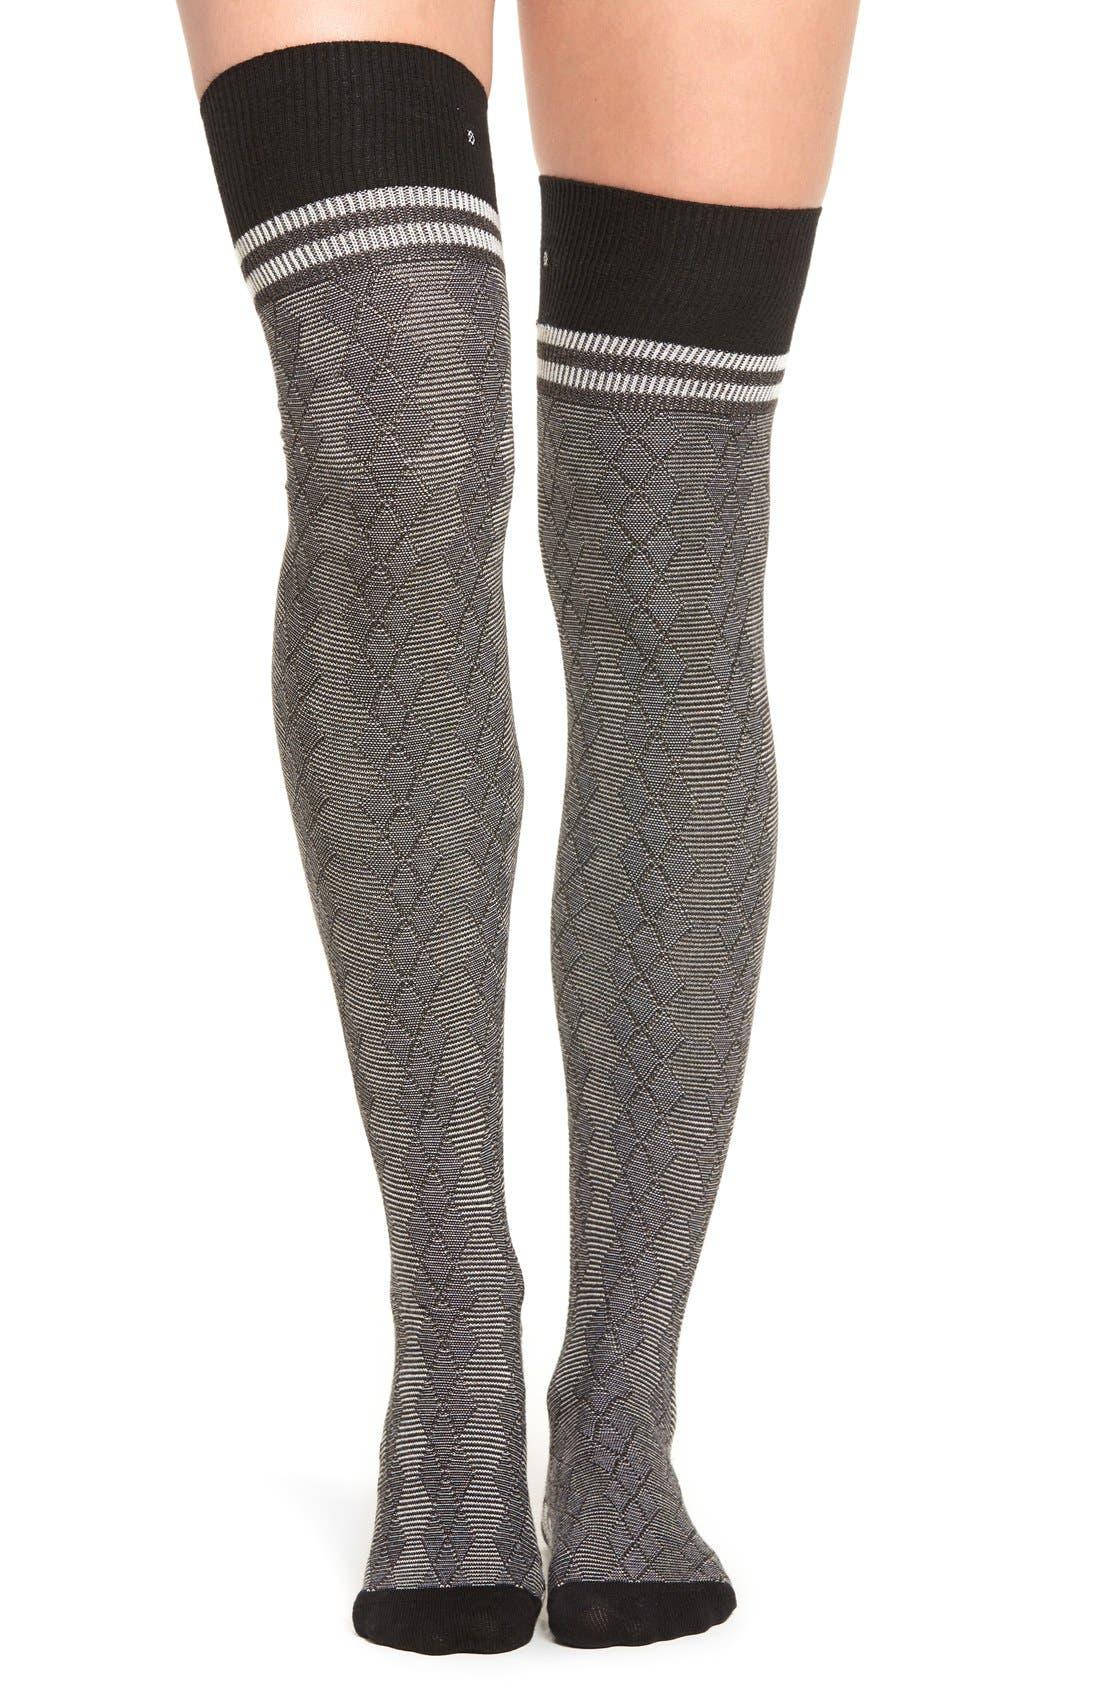 Alternate Image 1 Selected - Stance 'Fine Line' Over the Knee Socks